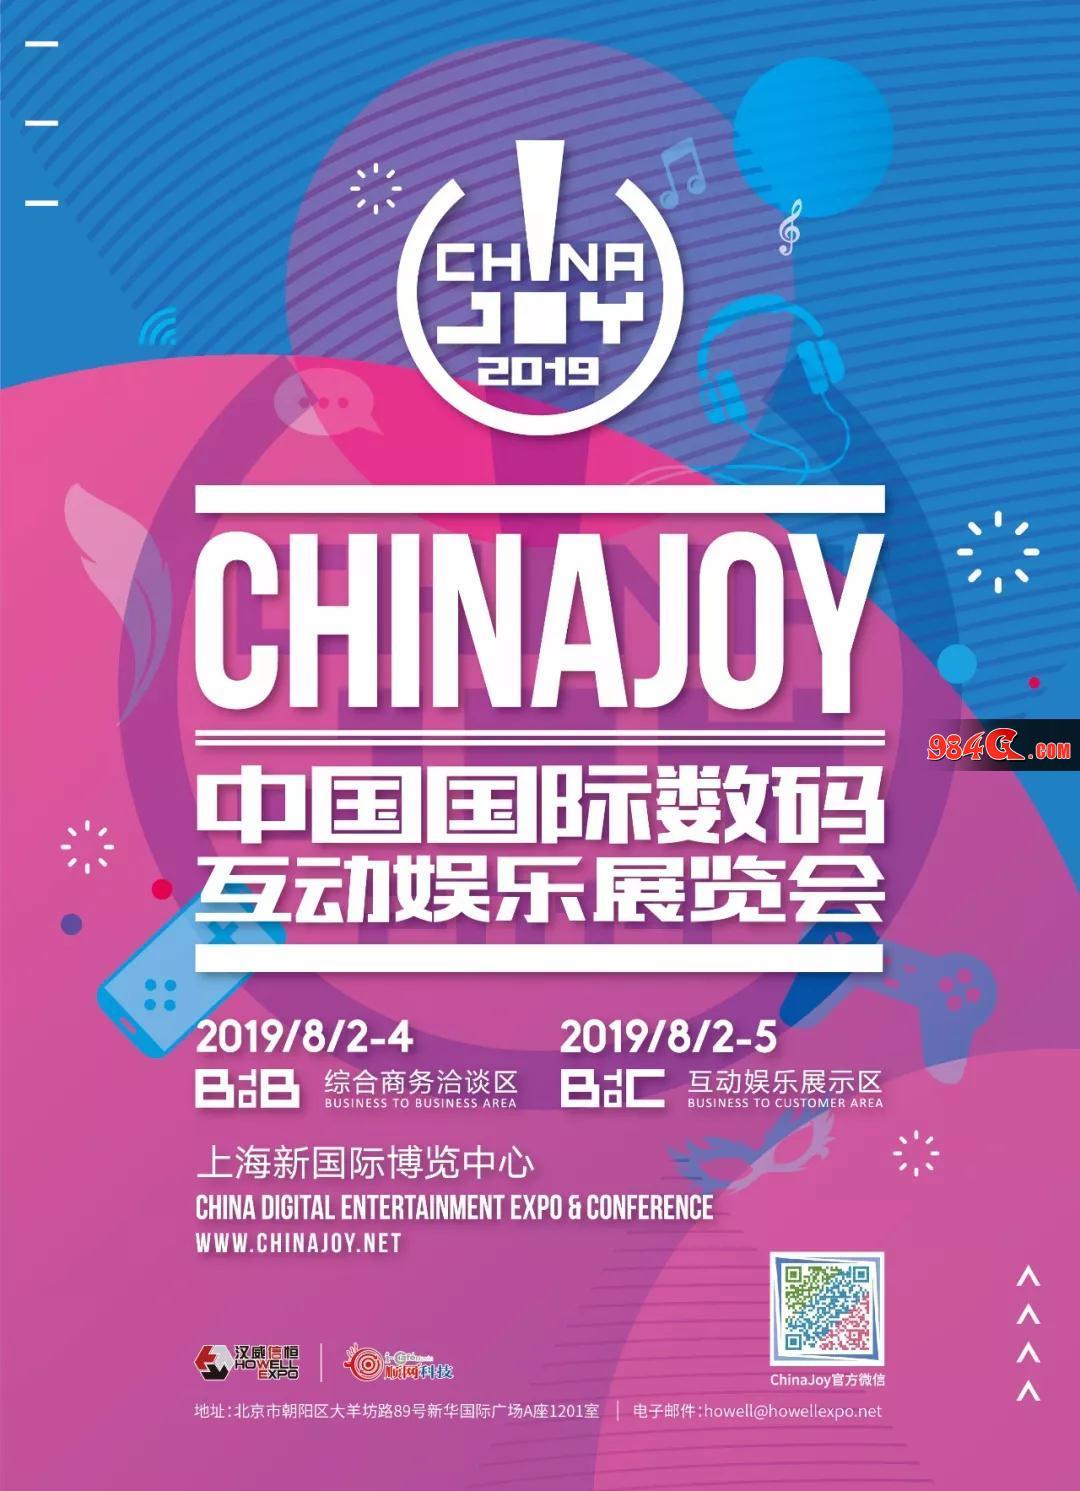 MENA Mobile,2019 ChinaJoy BTOB